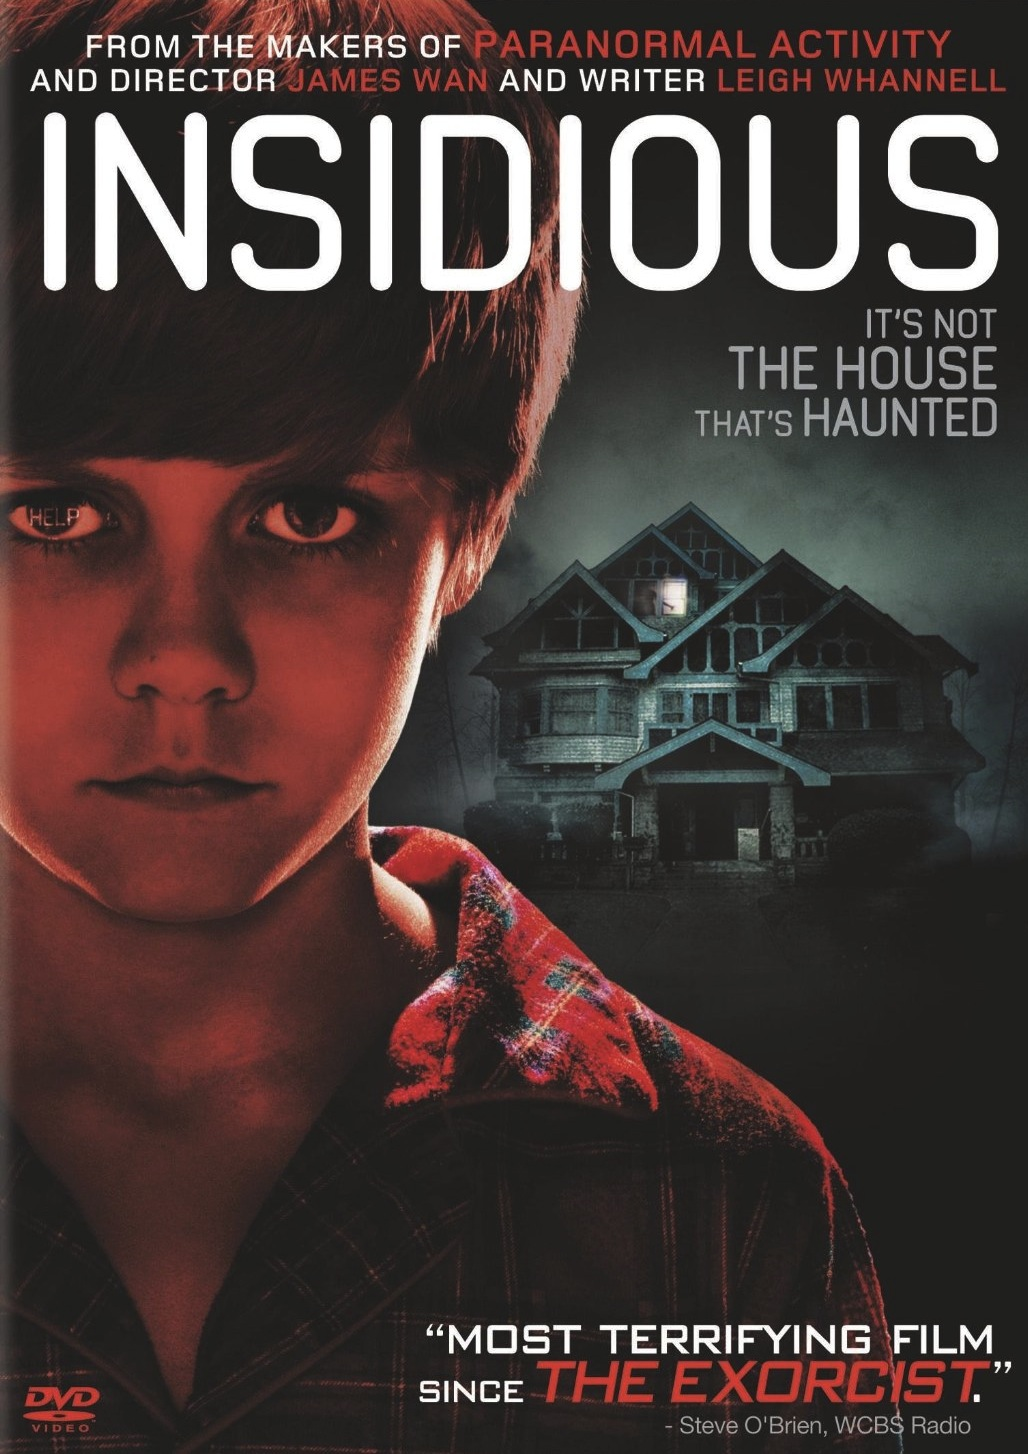 Film Insidious ke stažení - Film Insidious download